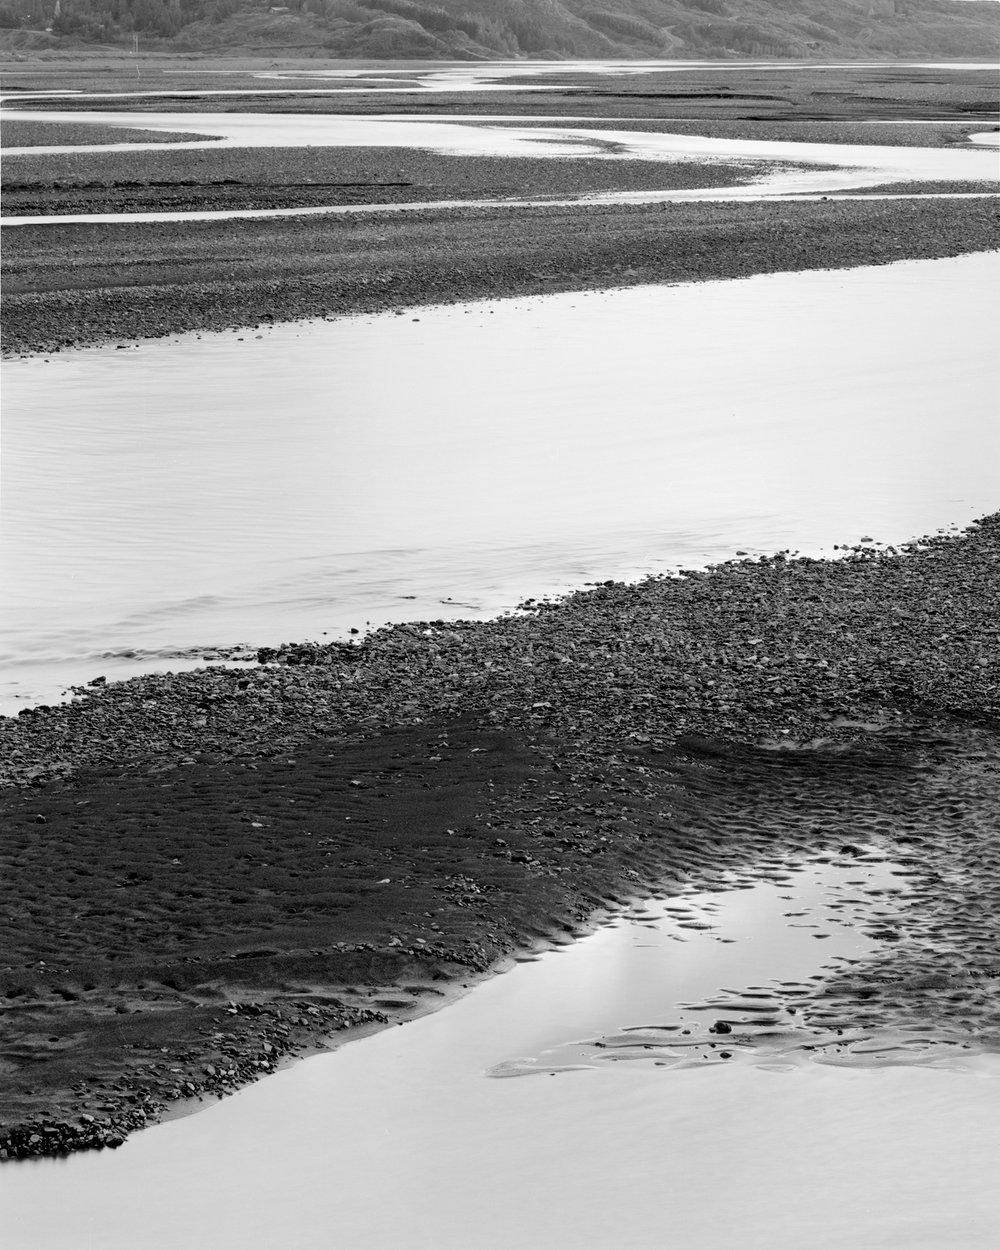 LANDEYJAHÖFN RIVER